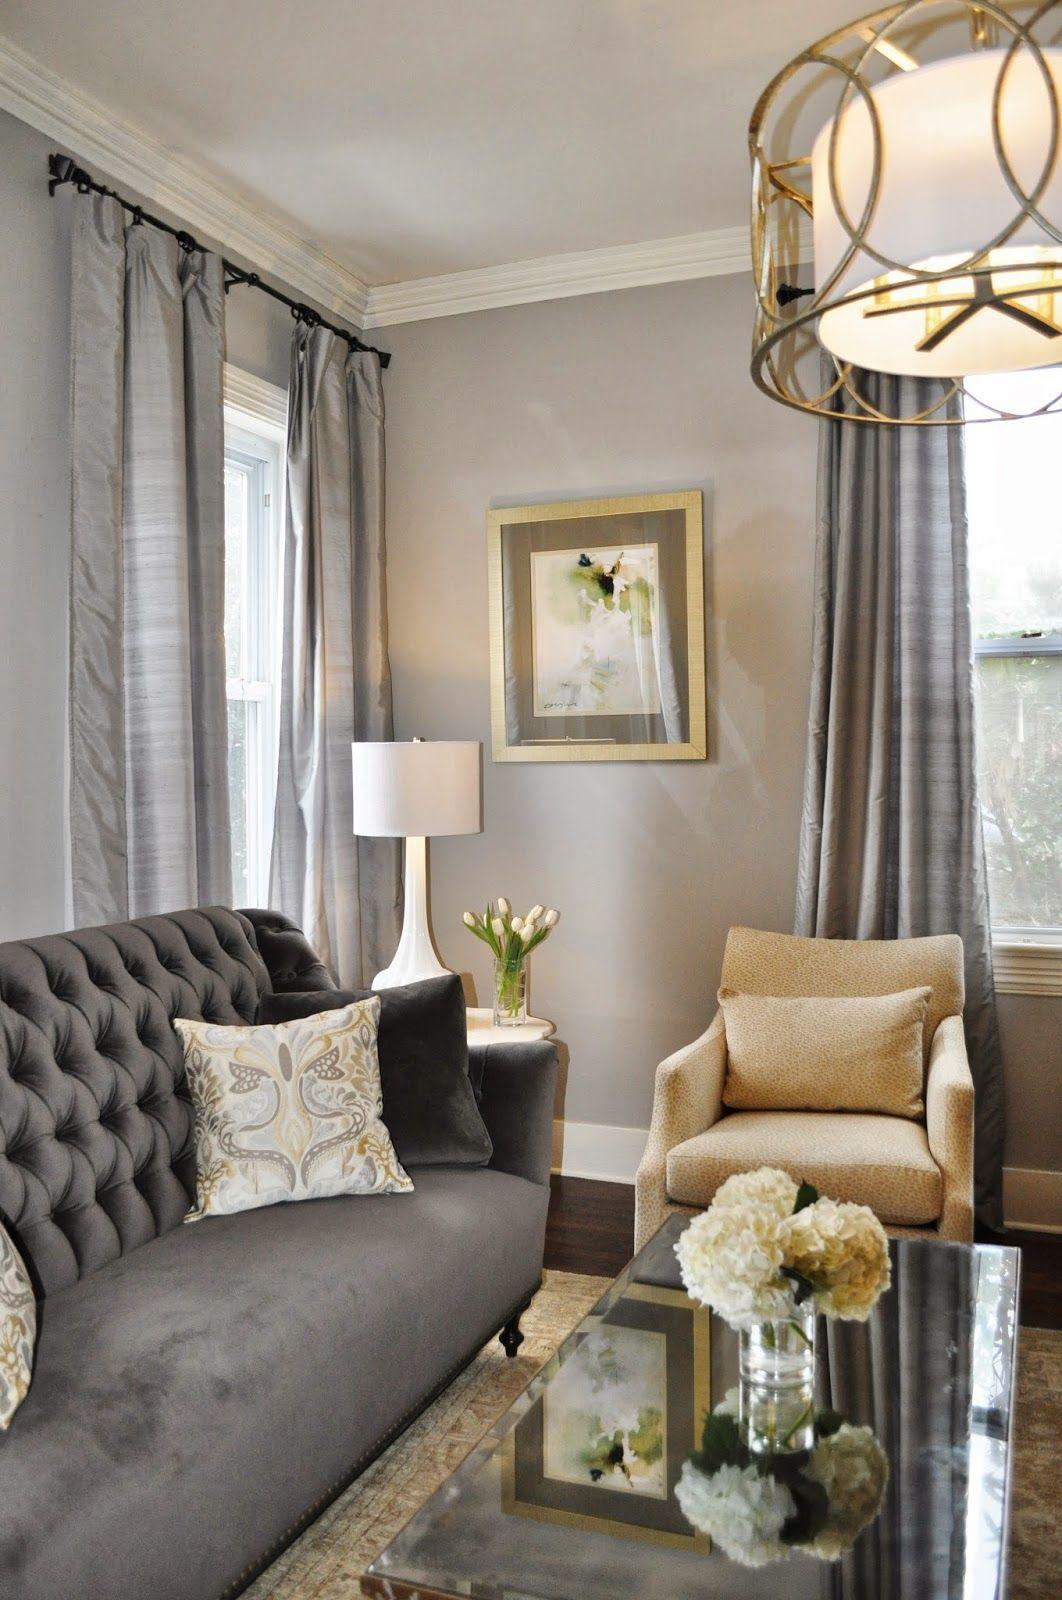 Portfolio Gold Living Room Gold Accents Living Room Grey Sofa Living Room Living room ideas gold